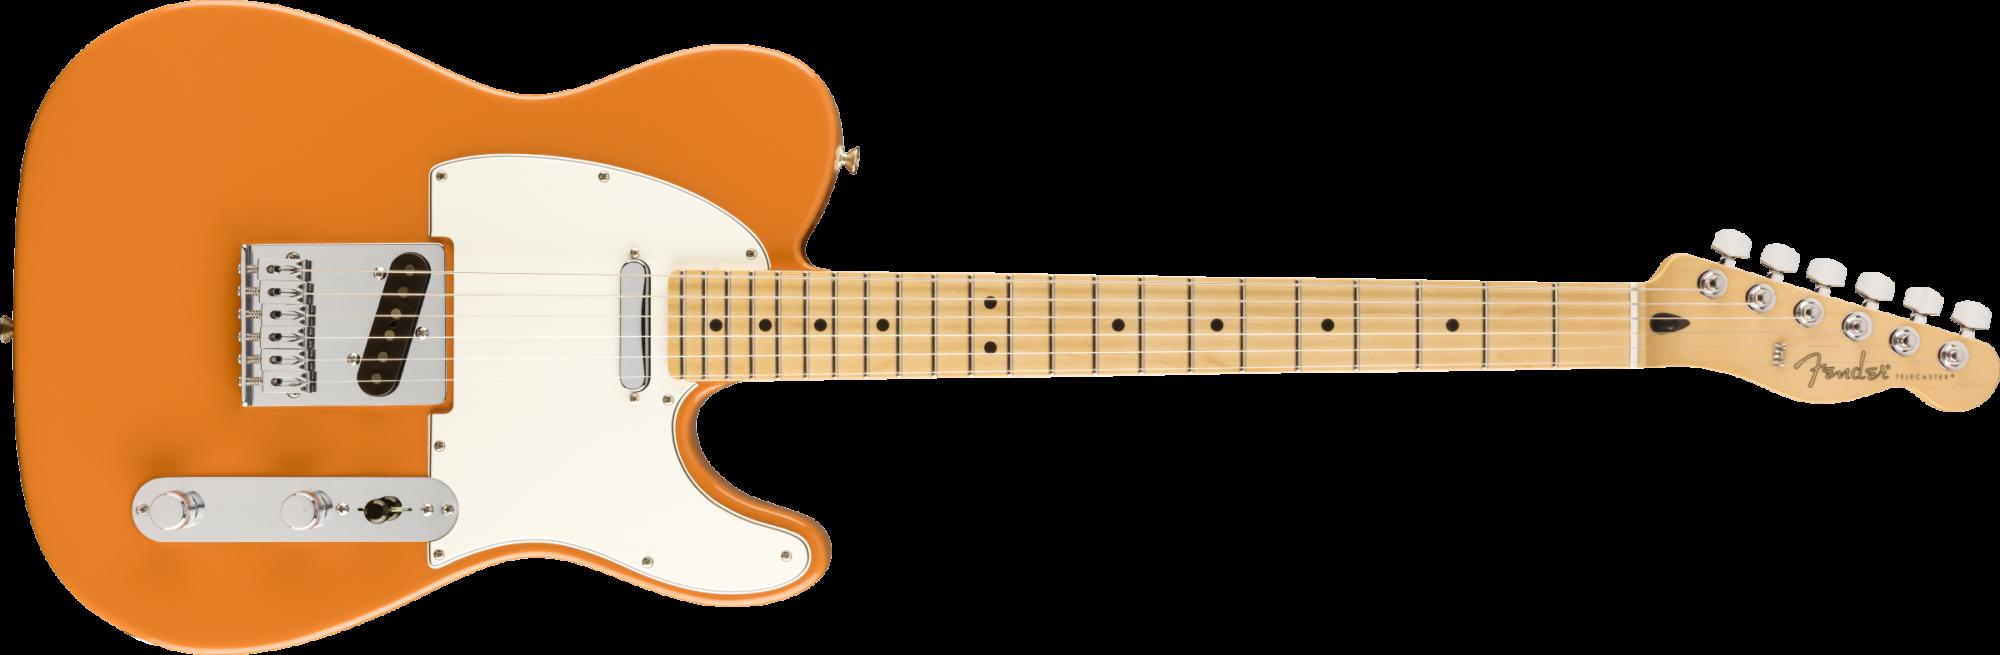 Fender Player Series Telecaster - Capri Orange